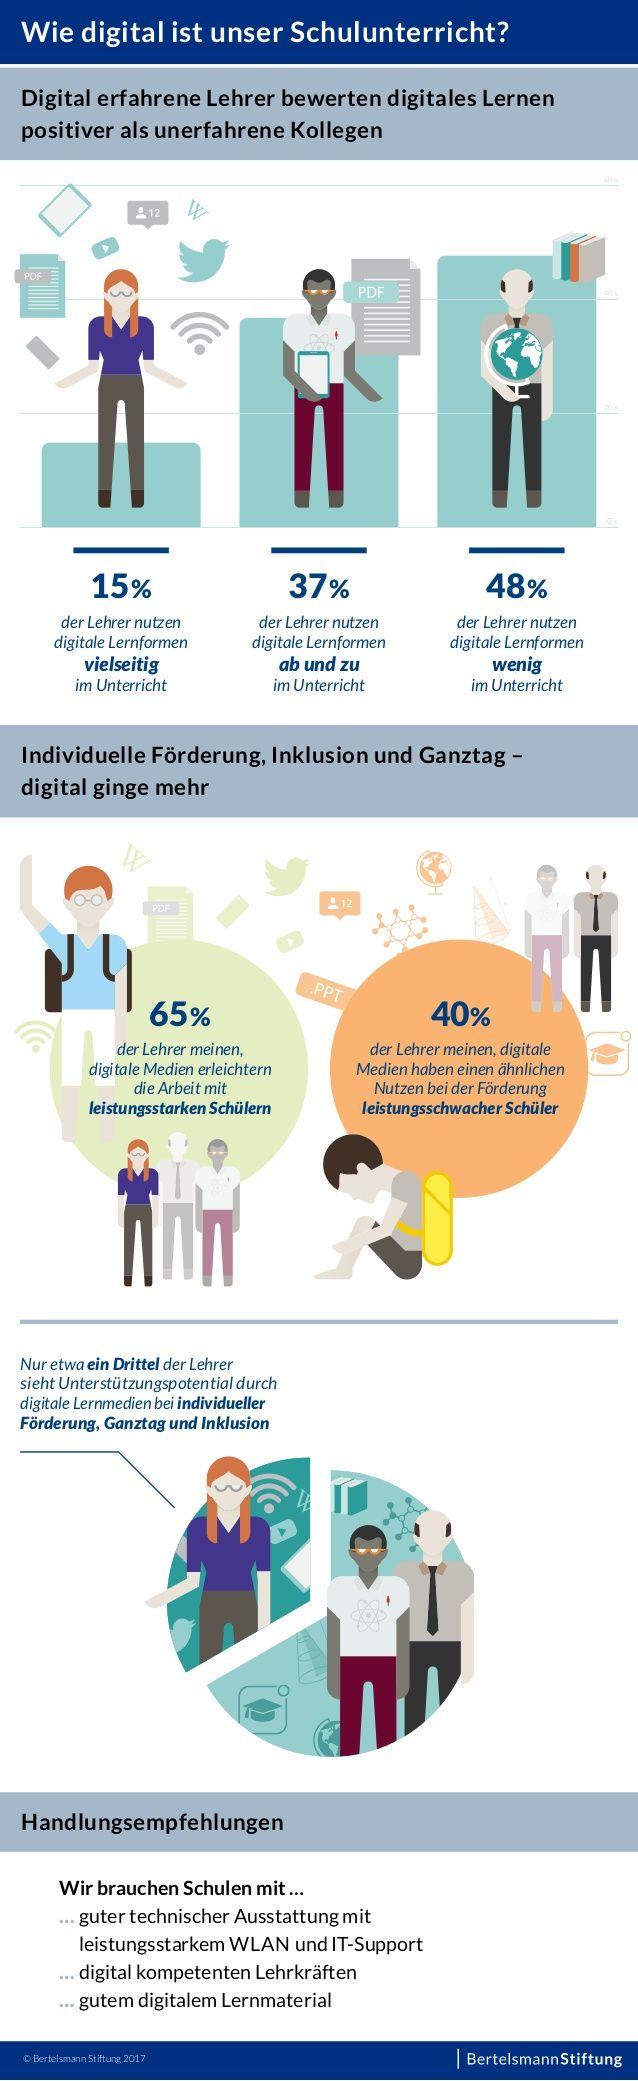 Infografik: Wie digital ist unser Schulunterricht? Monitor Digitale Bildung Bertelsmann Stiftung